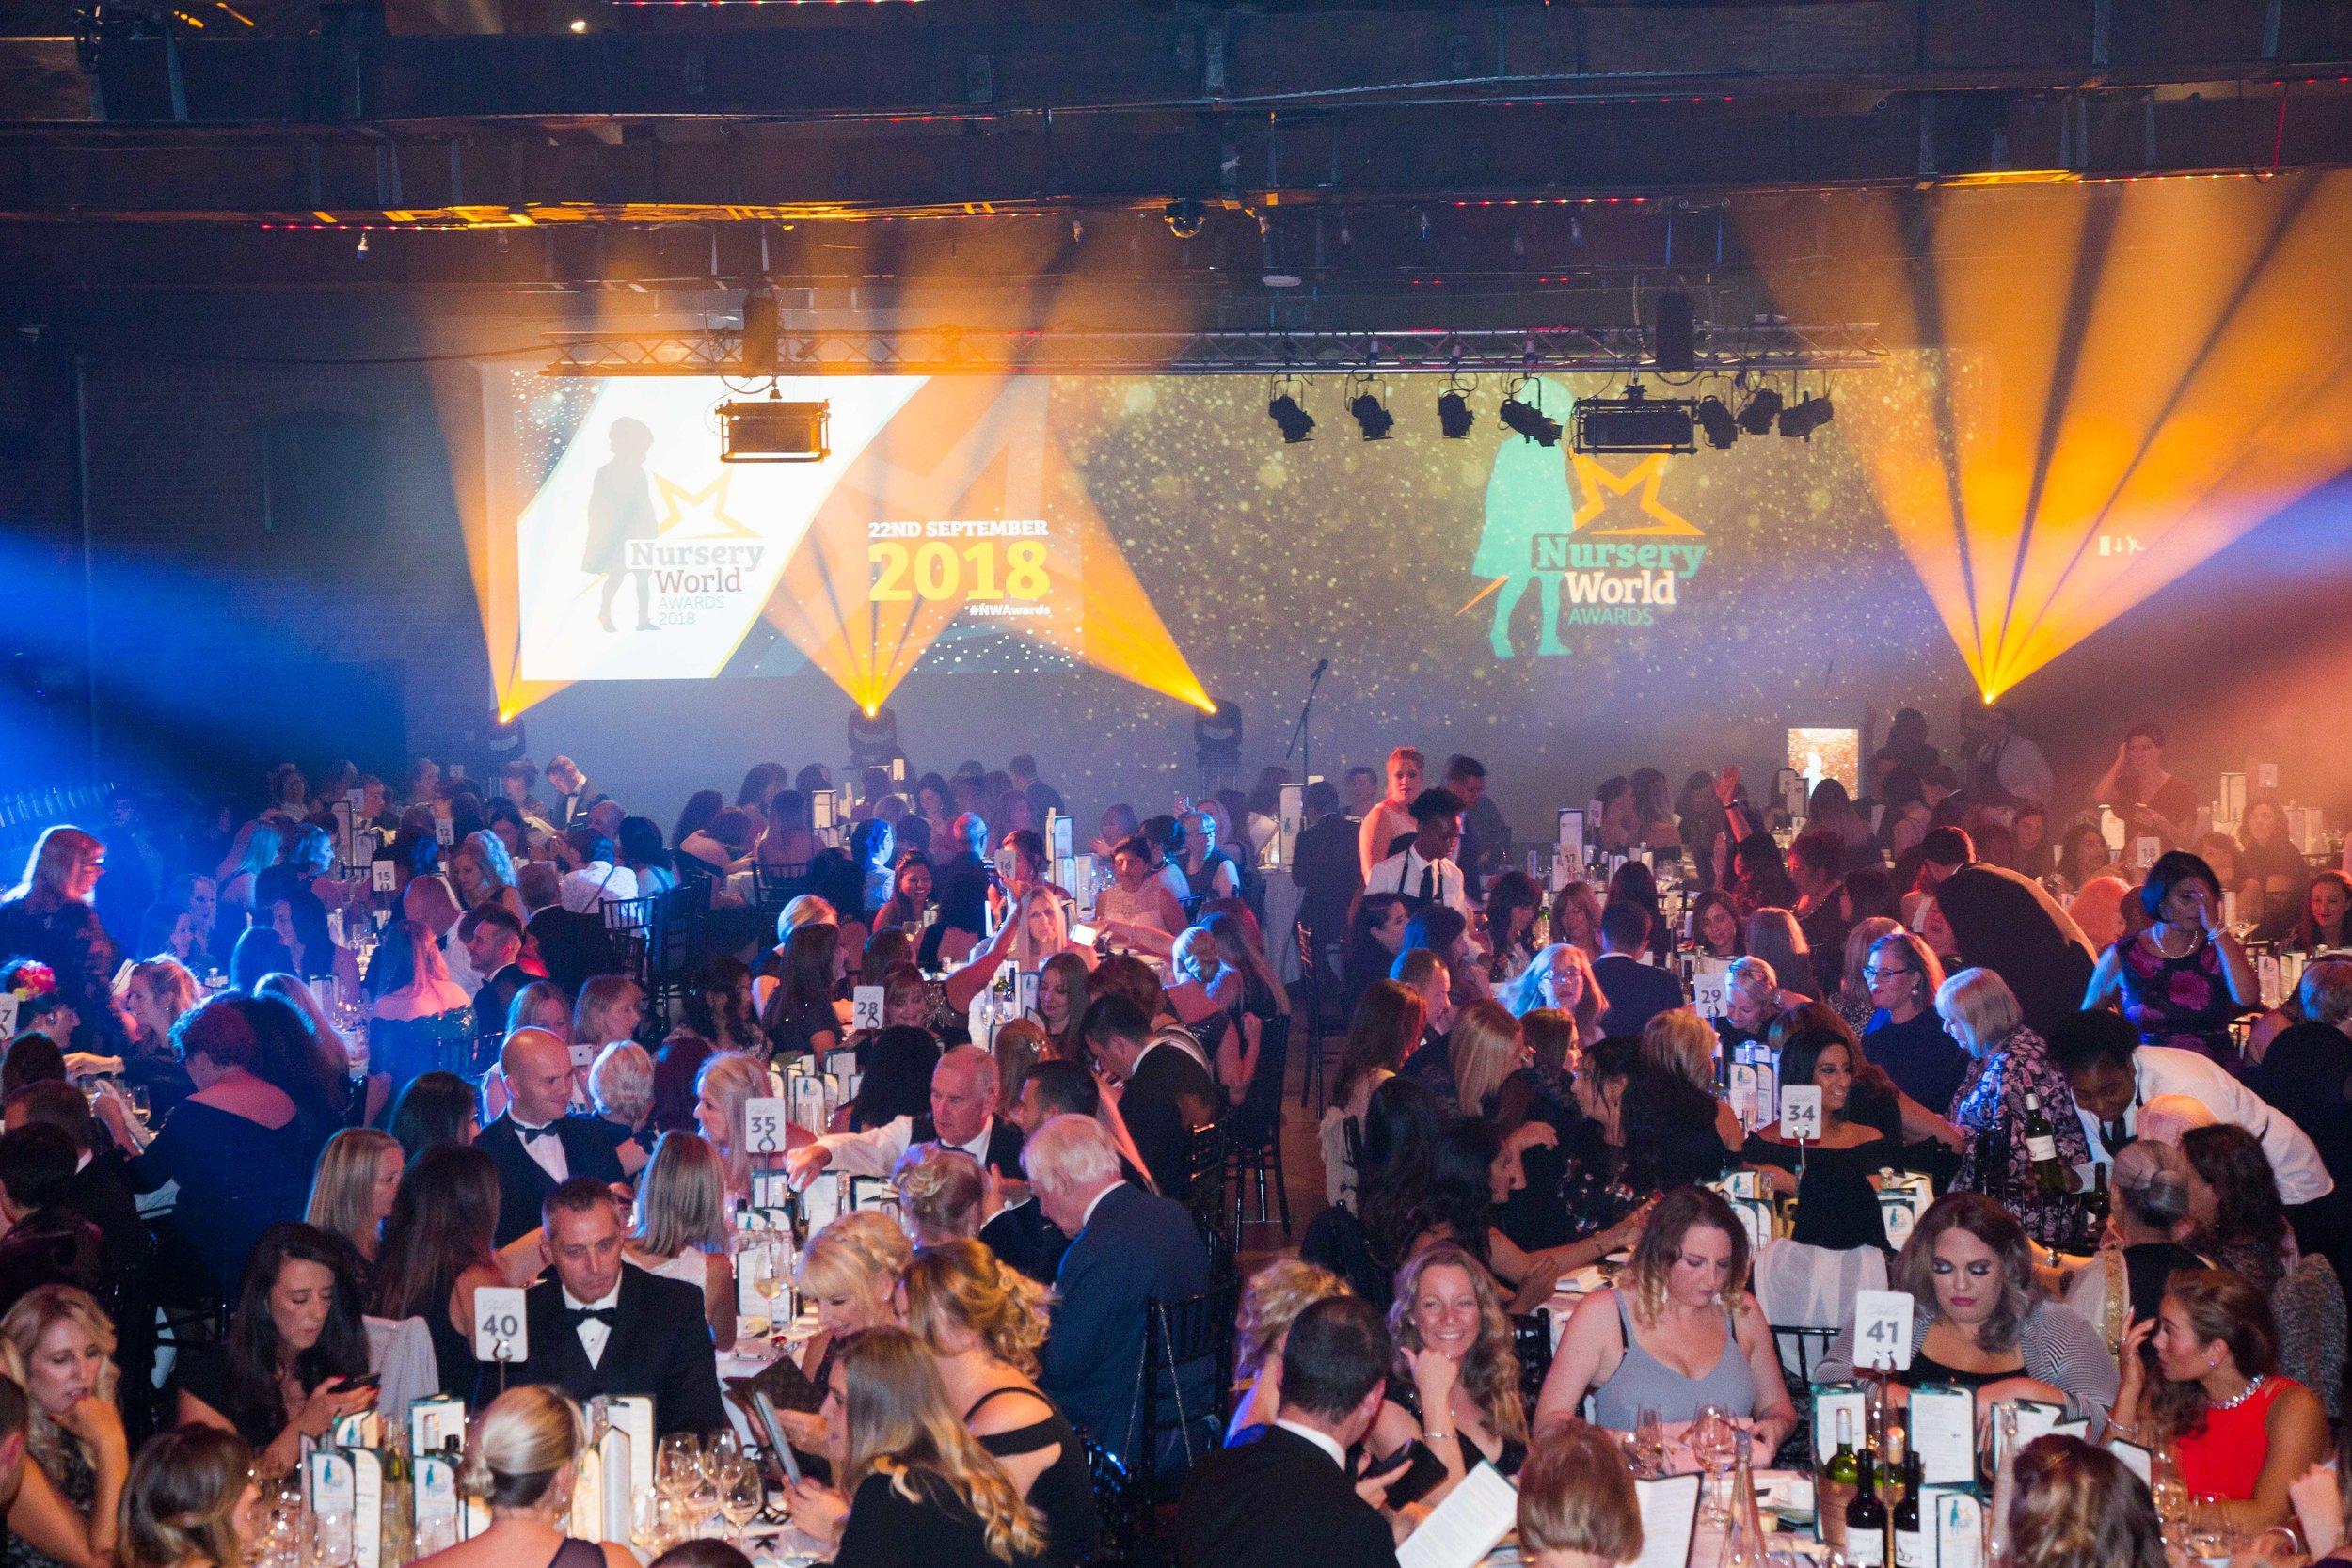 Celebrating the Nursery World Awards in London